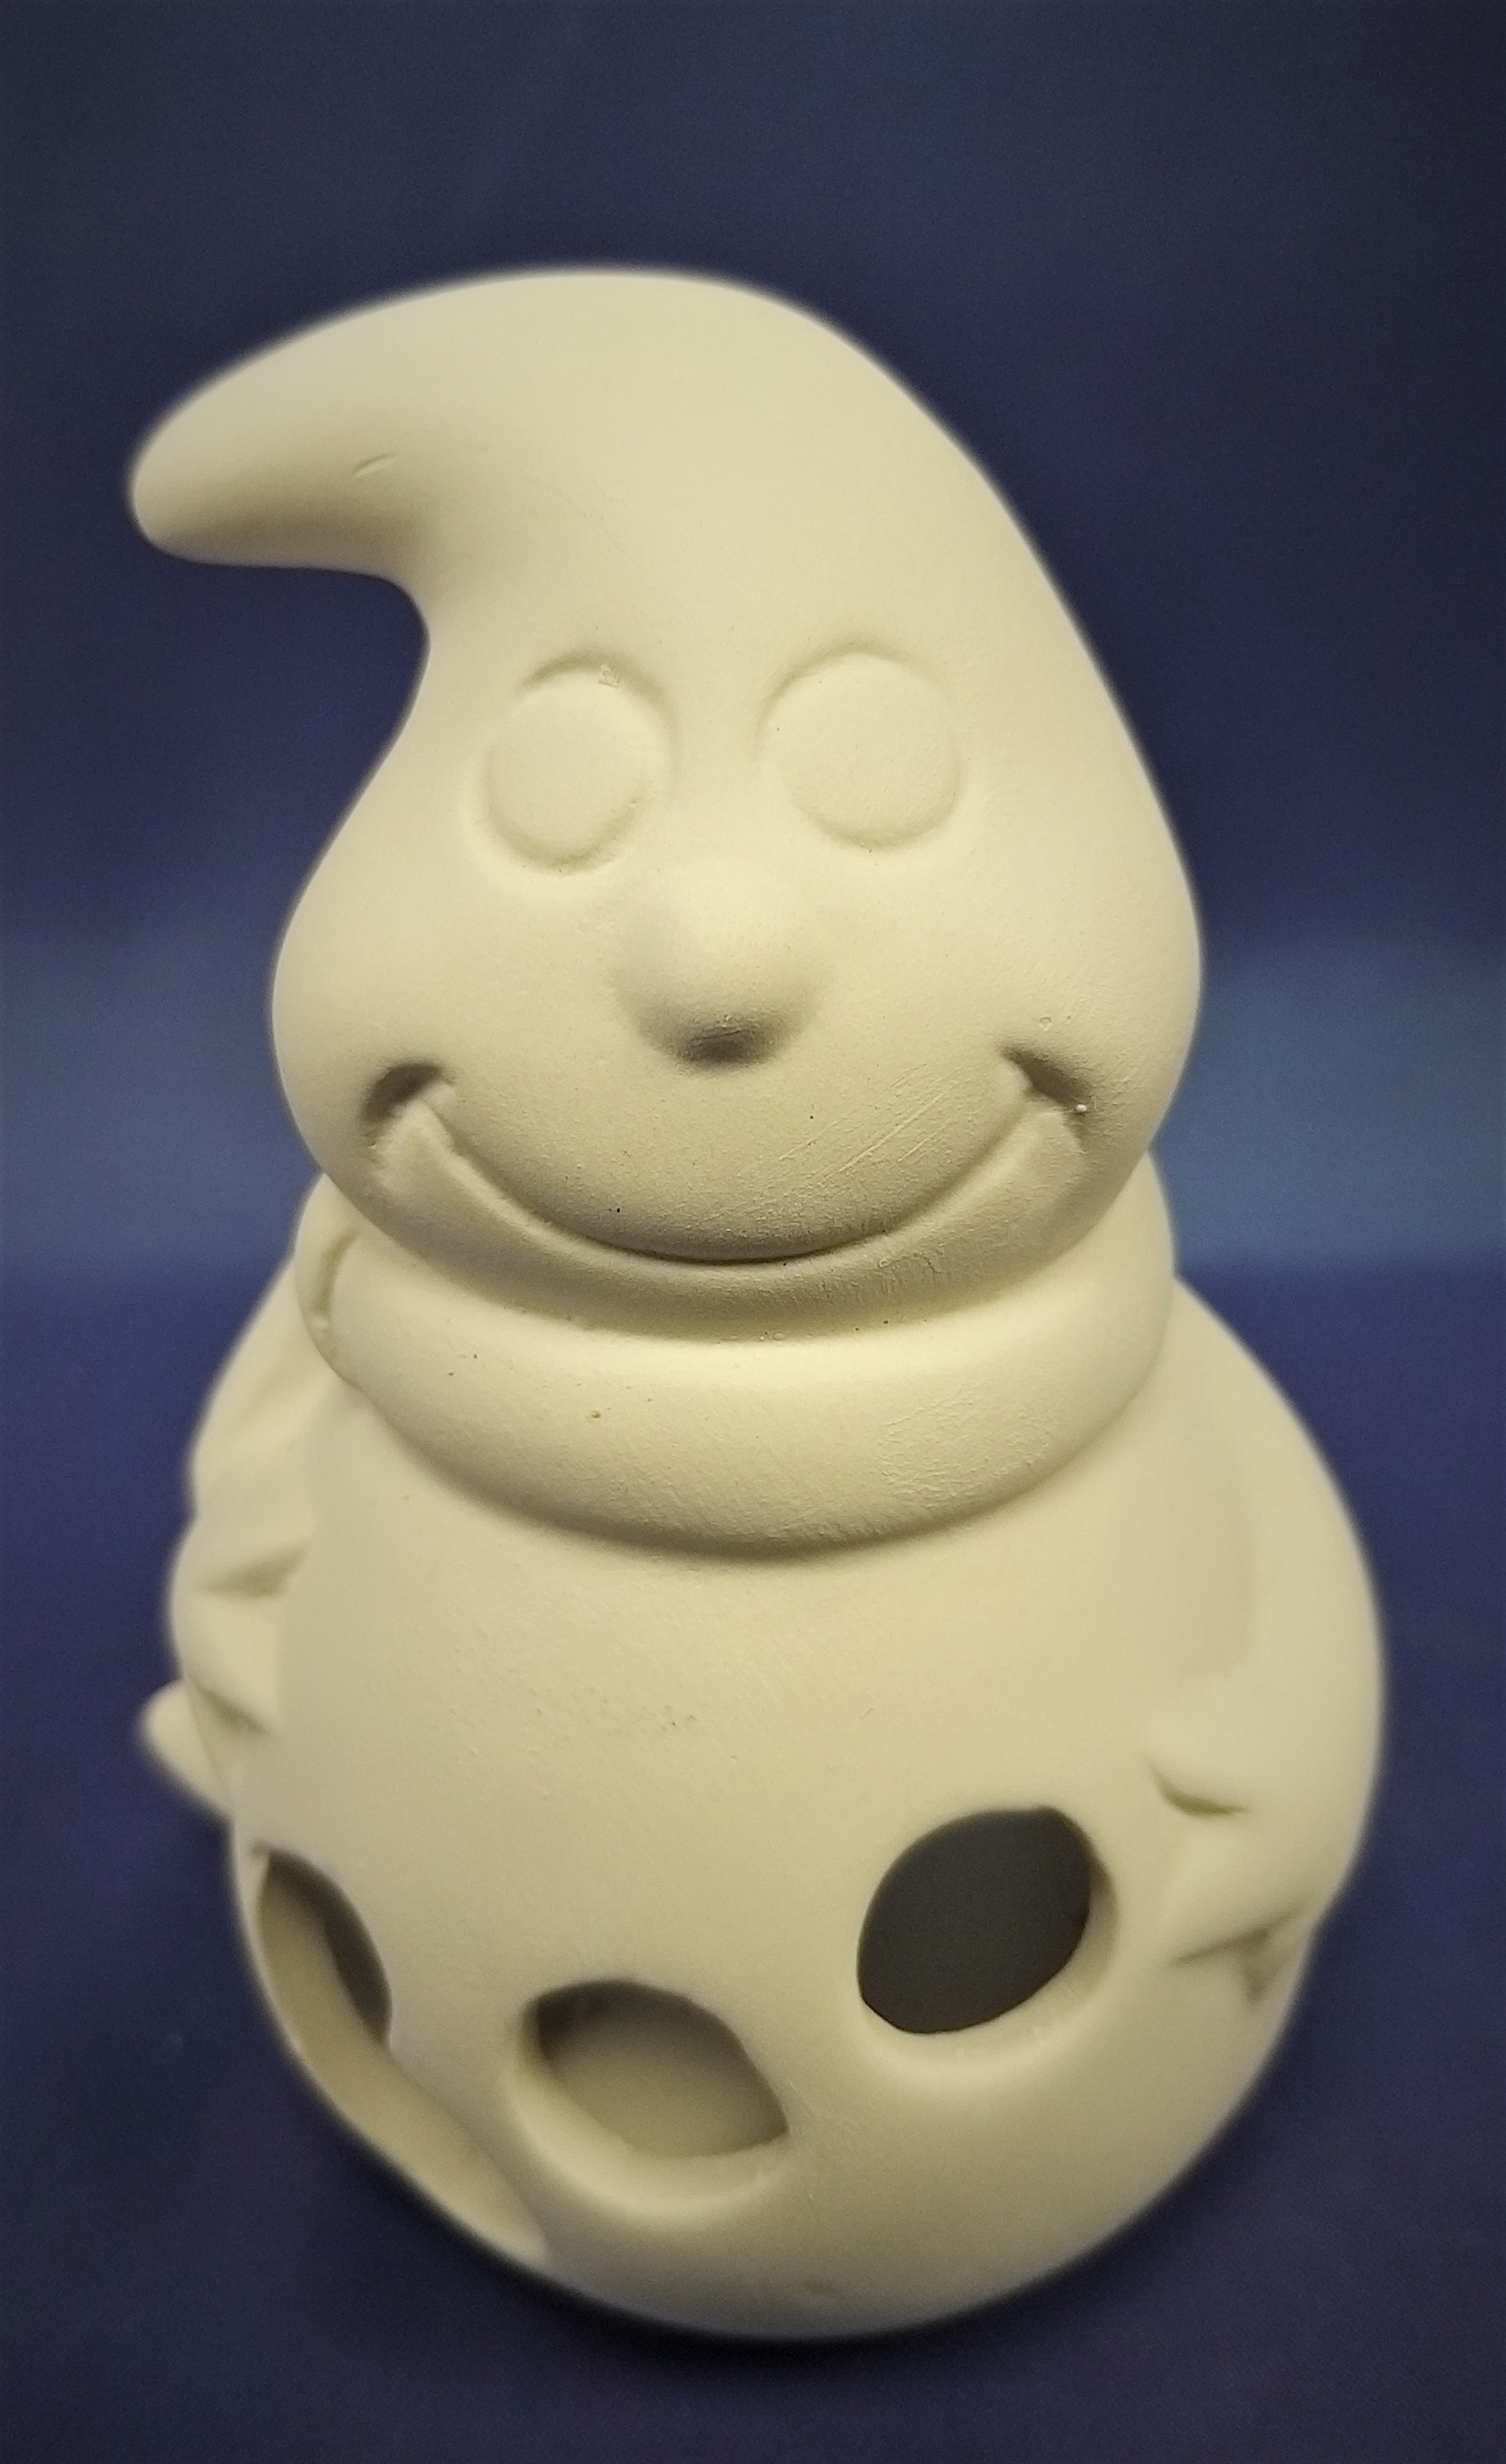 Ghost 'Boo' (T-light holder)